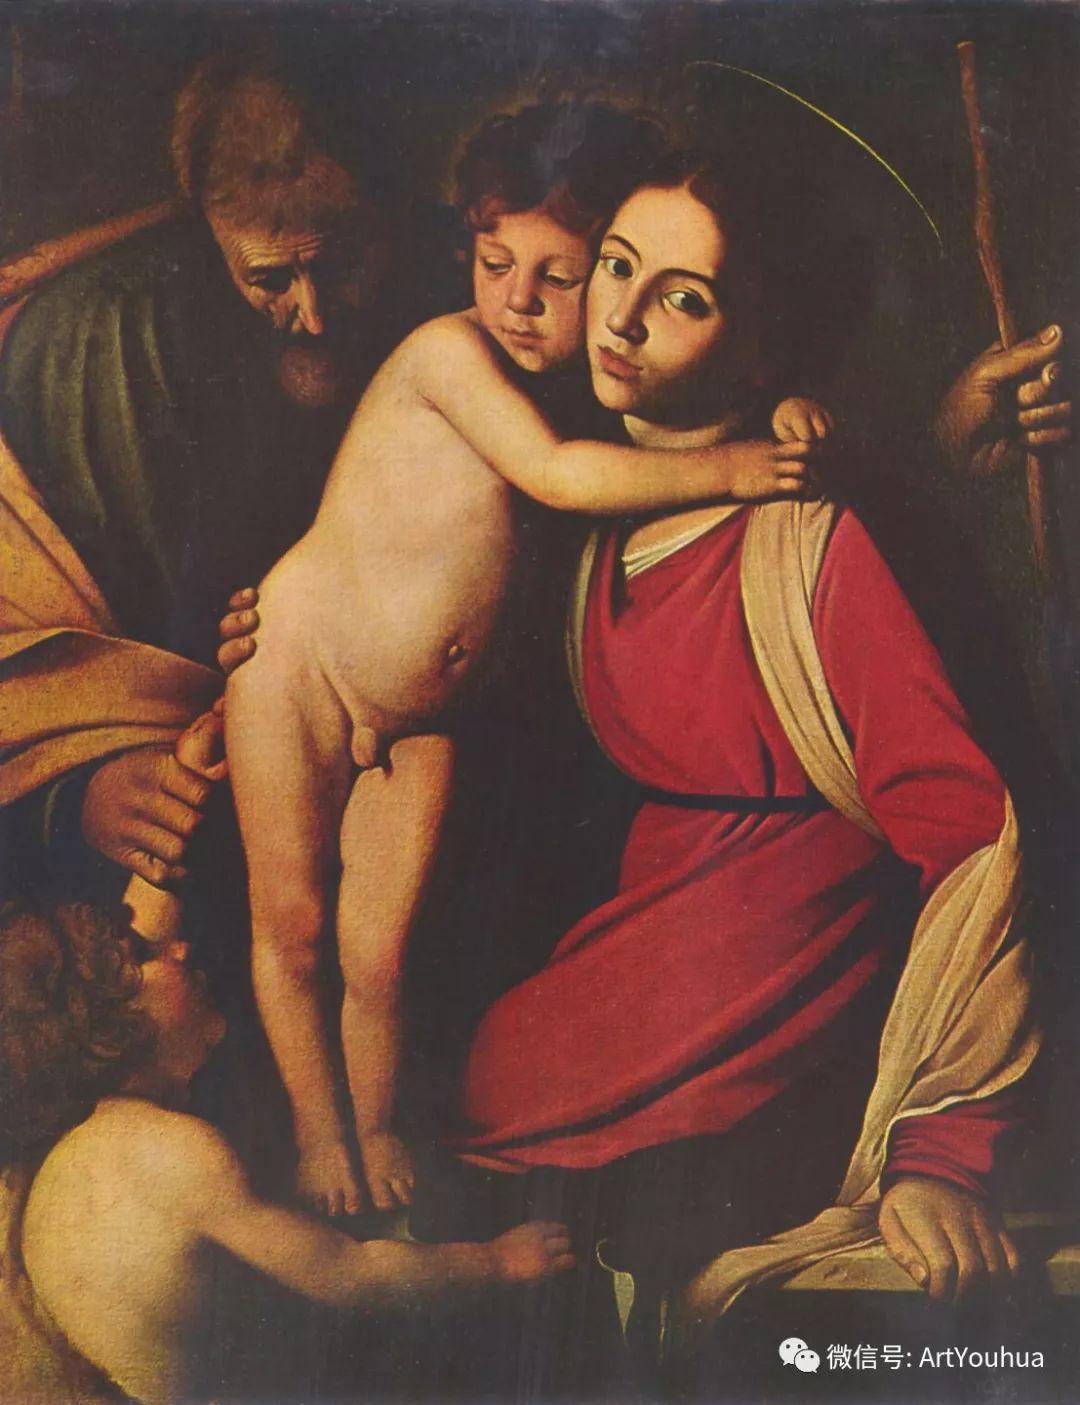 No.18 卡拉瓦乔 | 意大利16世纪末至17世纪初的著名画家插图93